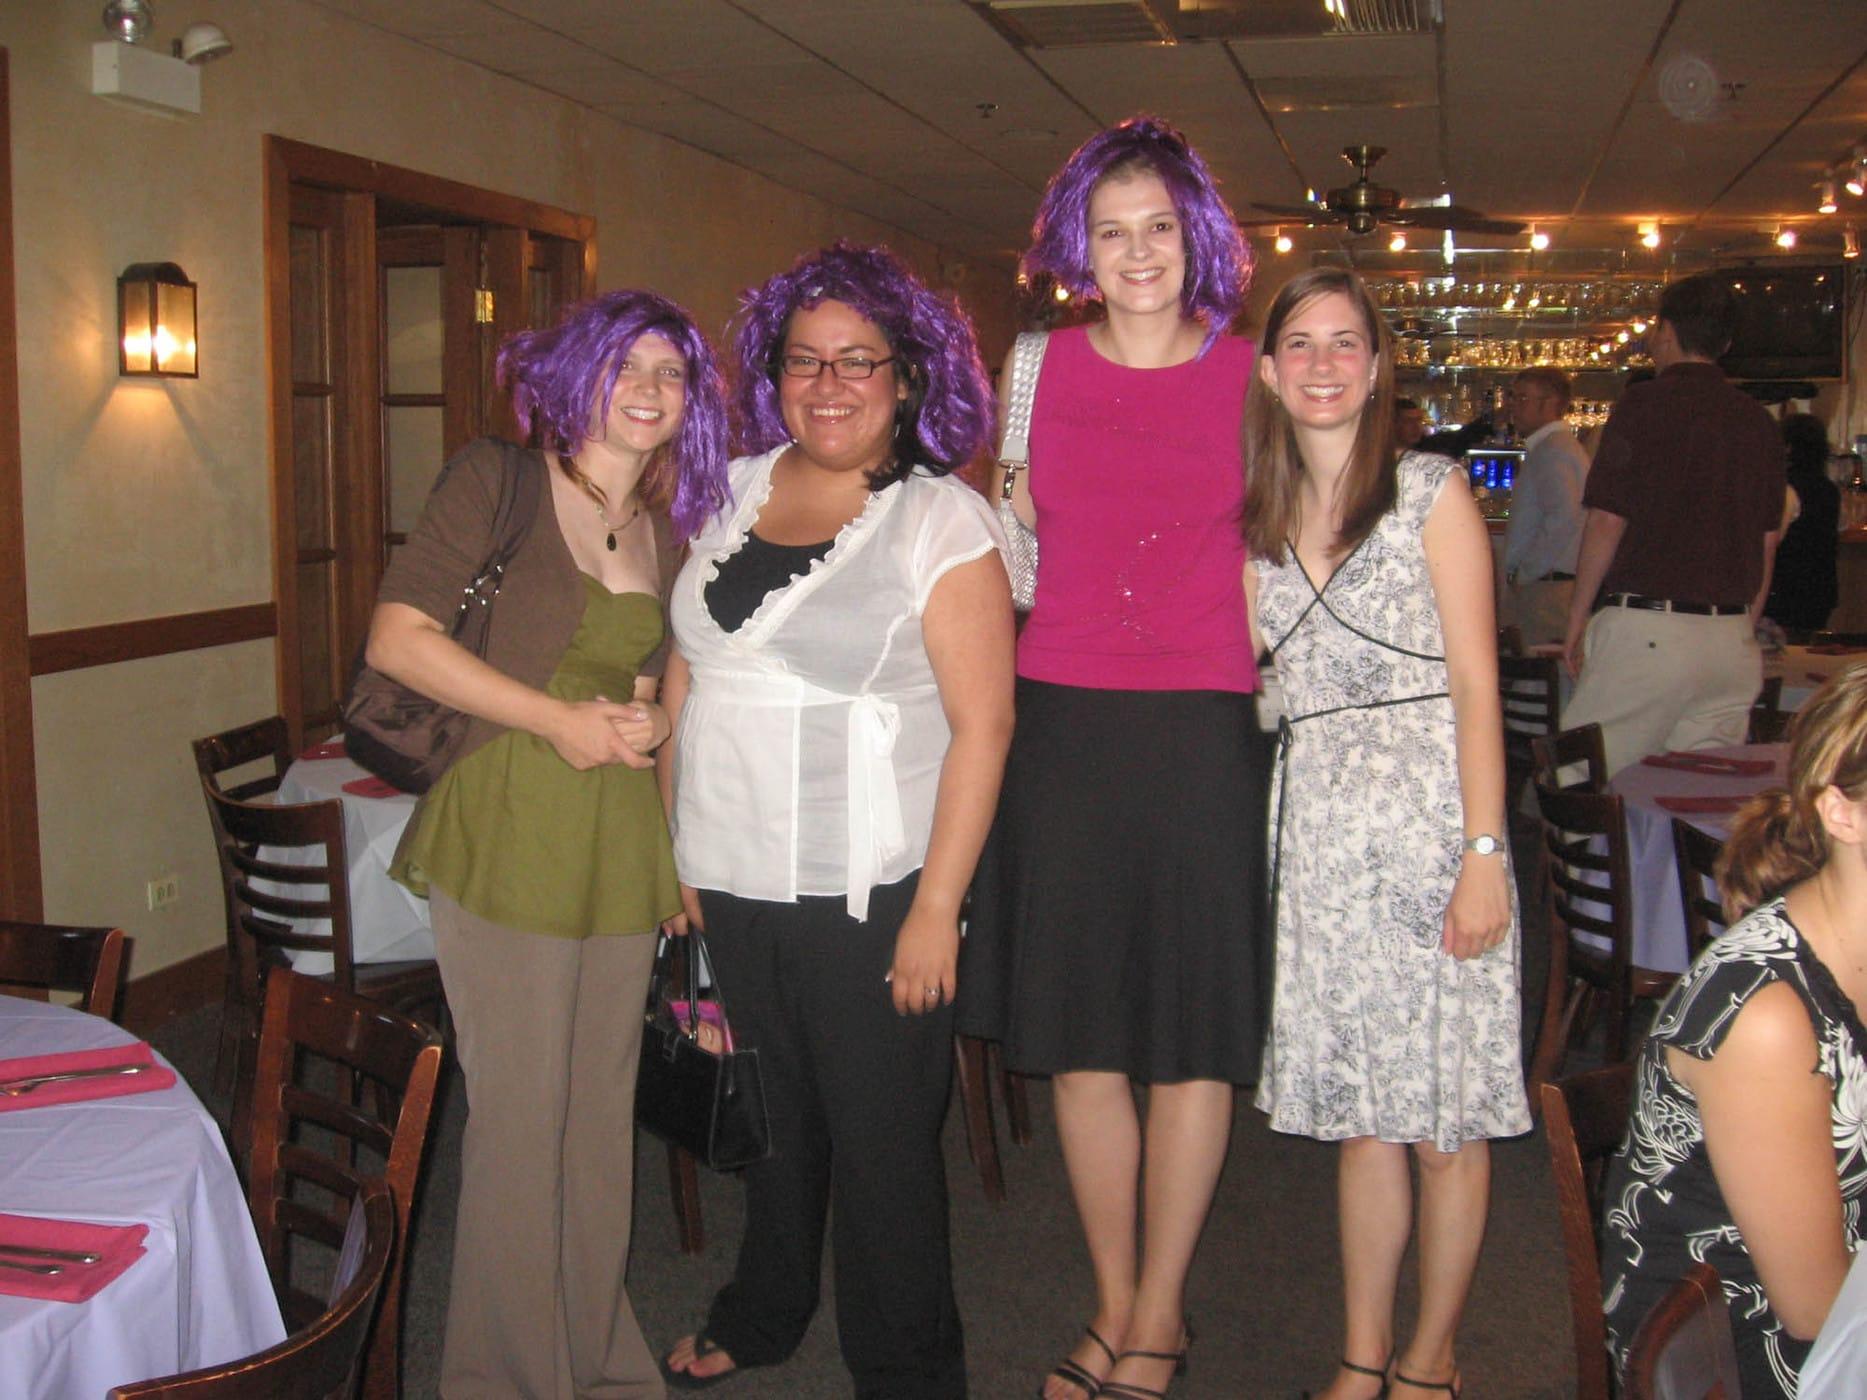 bridesmaids in purple wigs